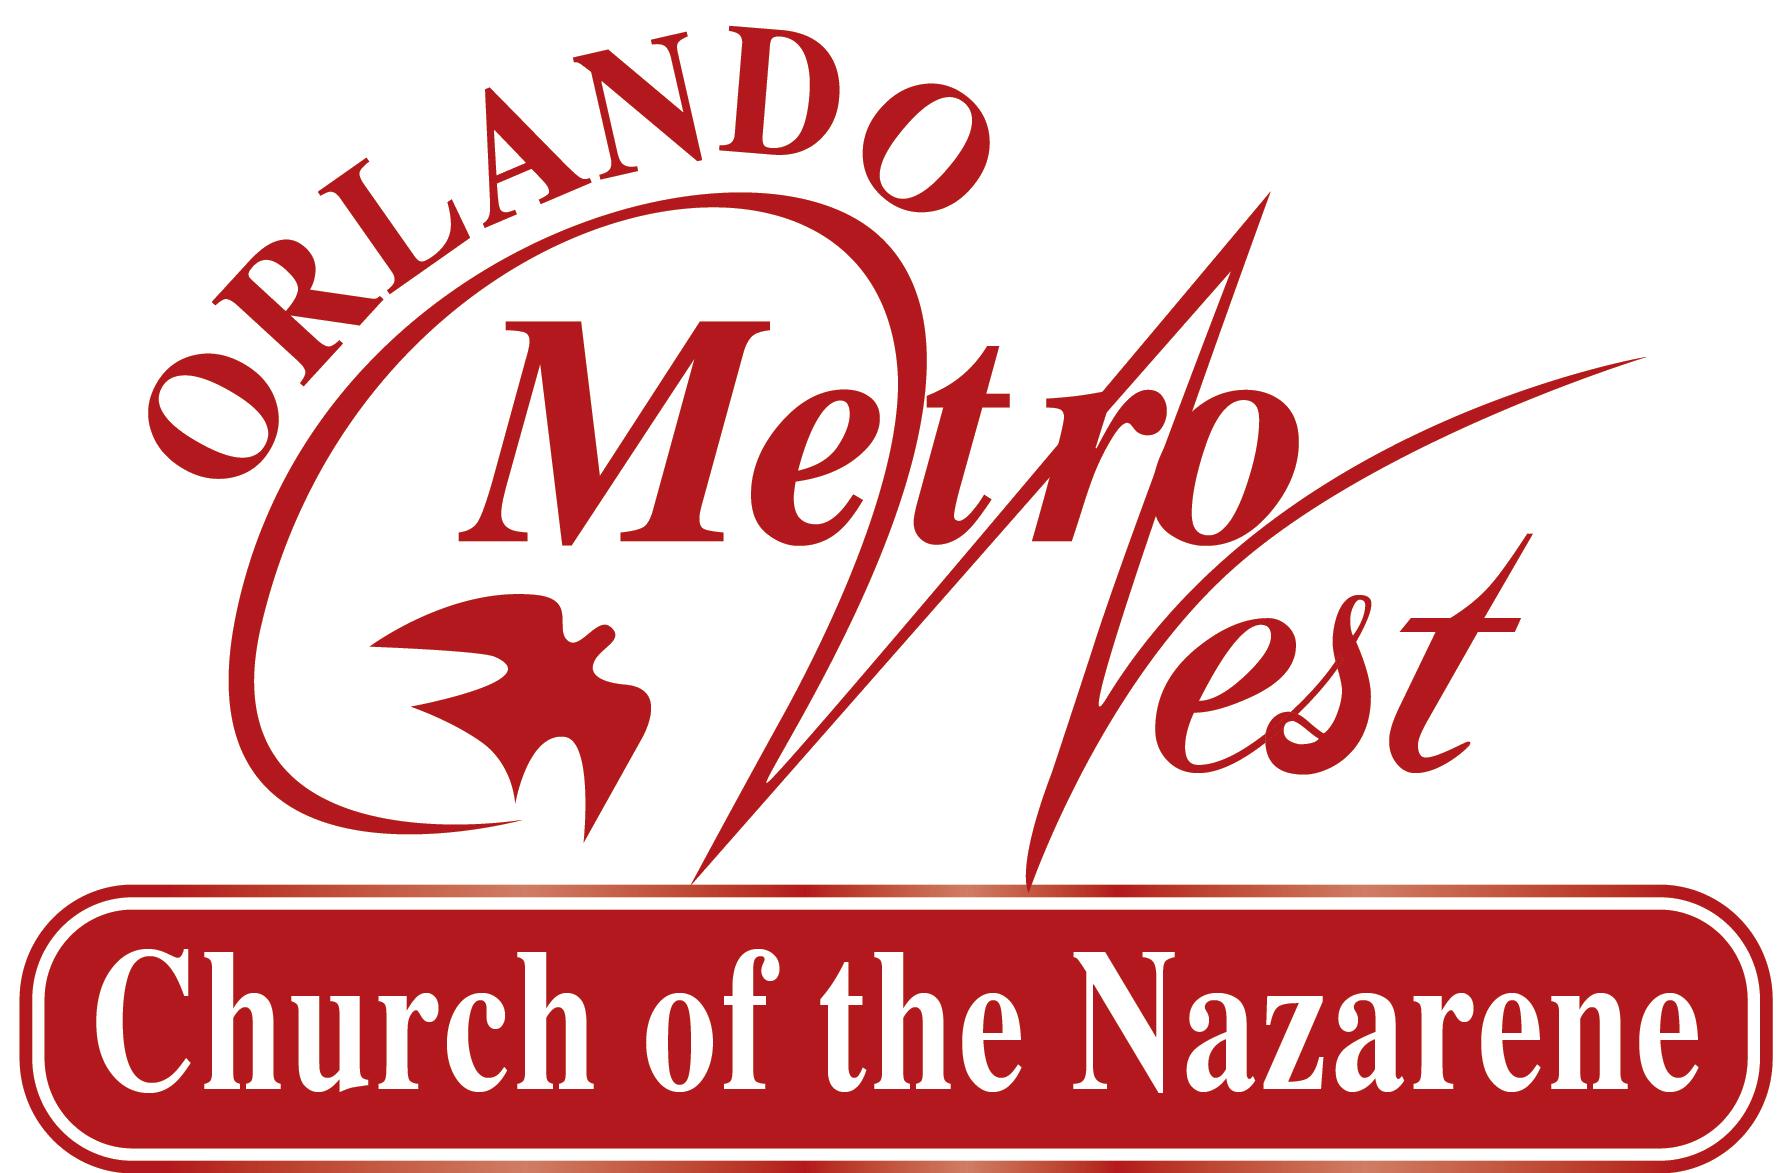 Orlando Metro West Church Of The Nazarene